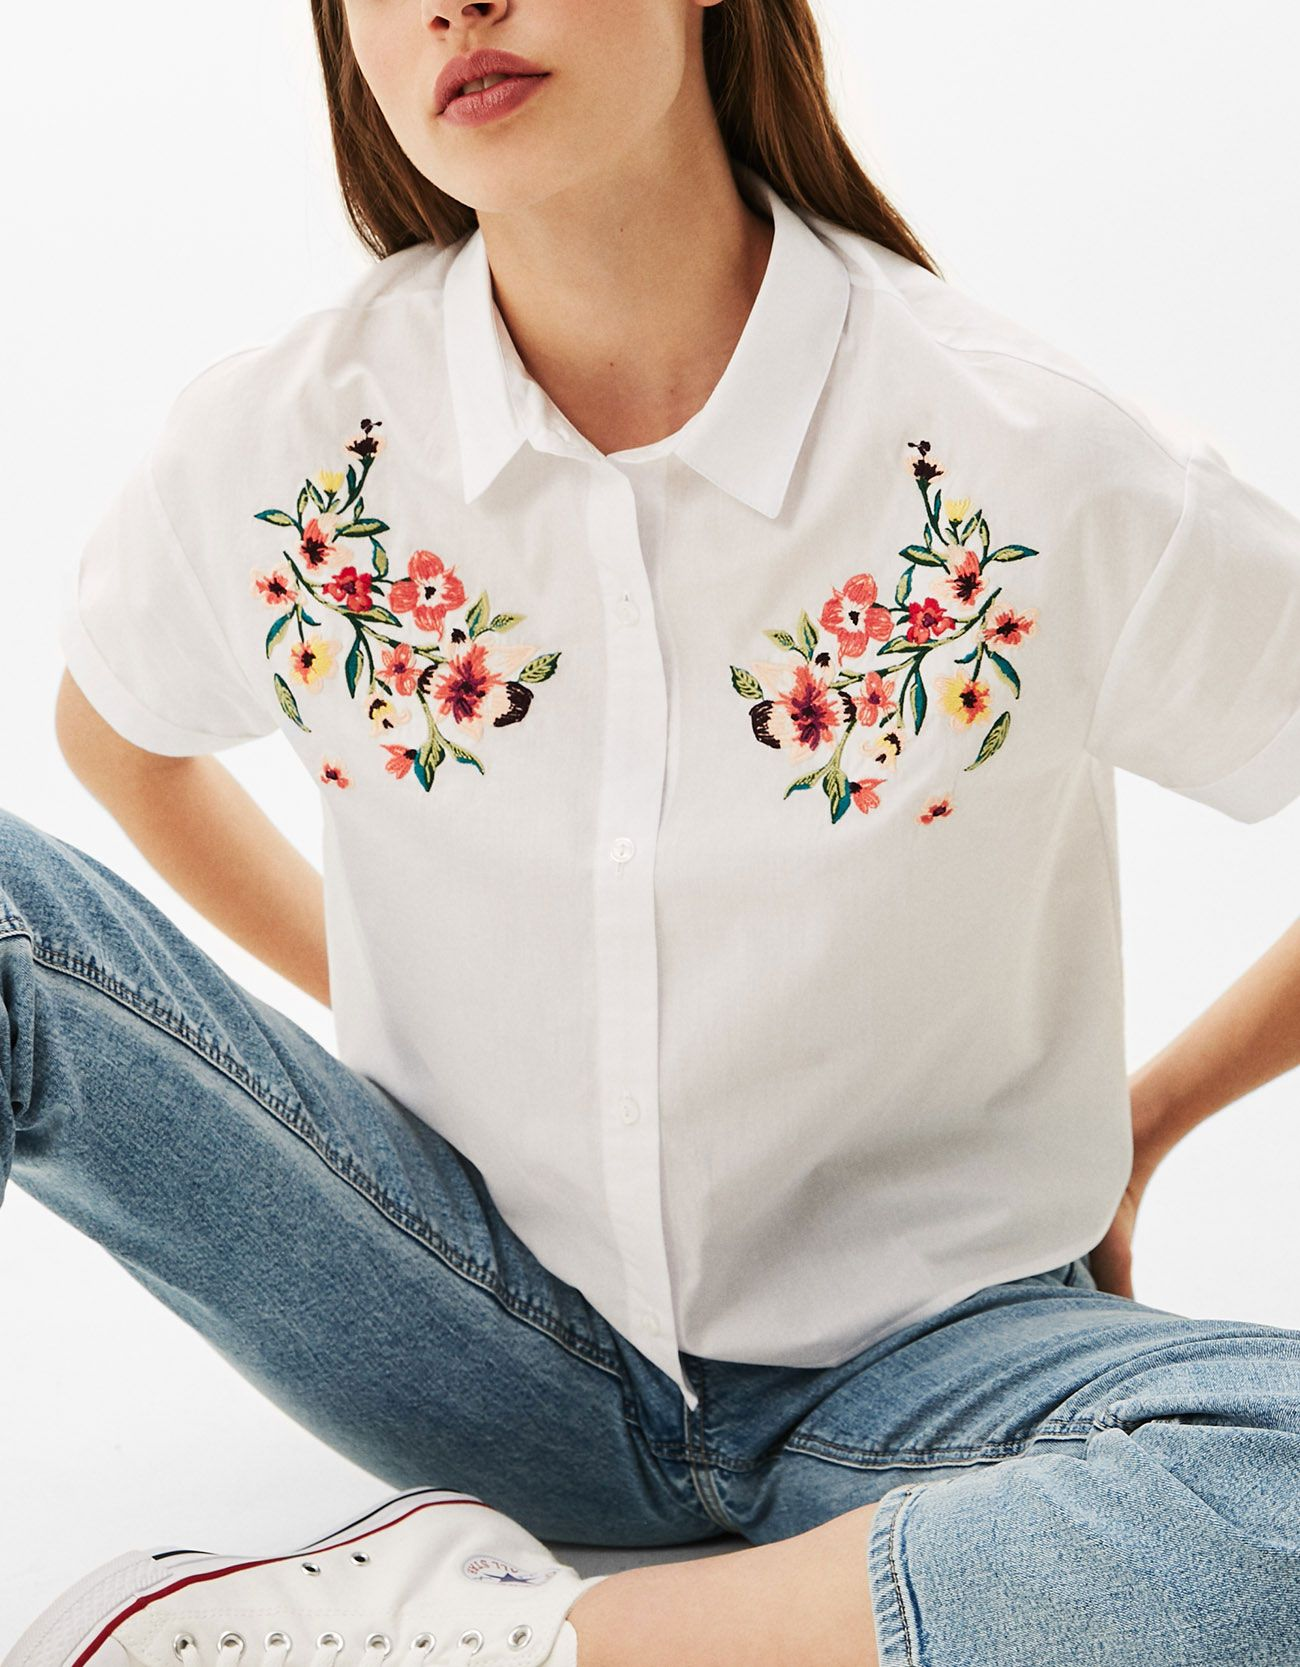 CAMISA BORDADA FLORES | Blusas | Pinterest | Camisas